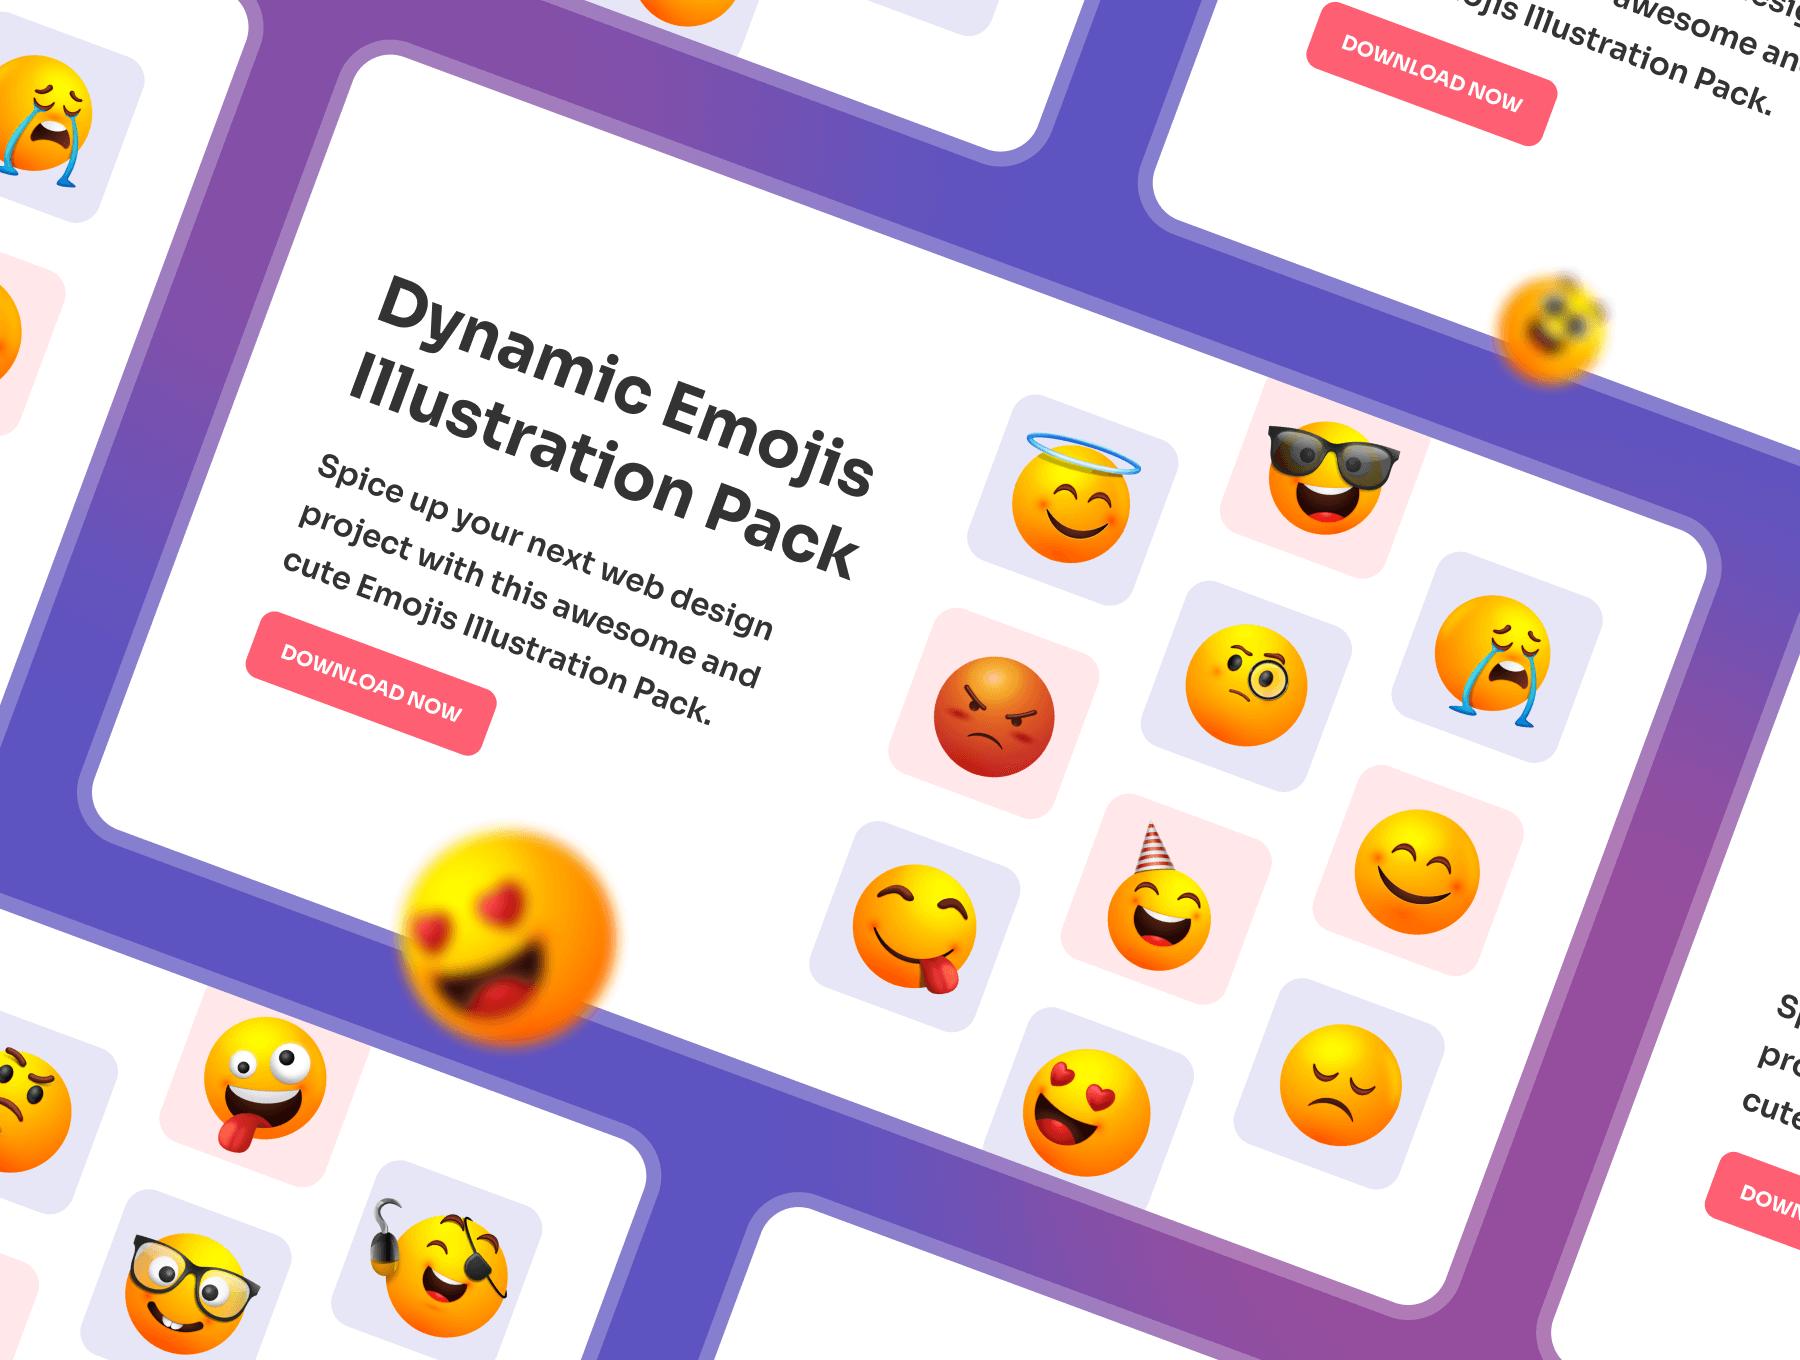 Dynamic Emojis Illustration Pack